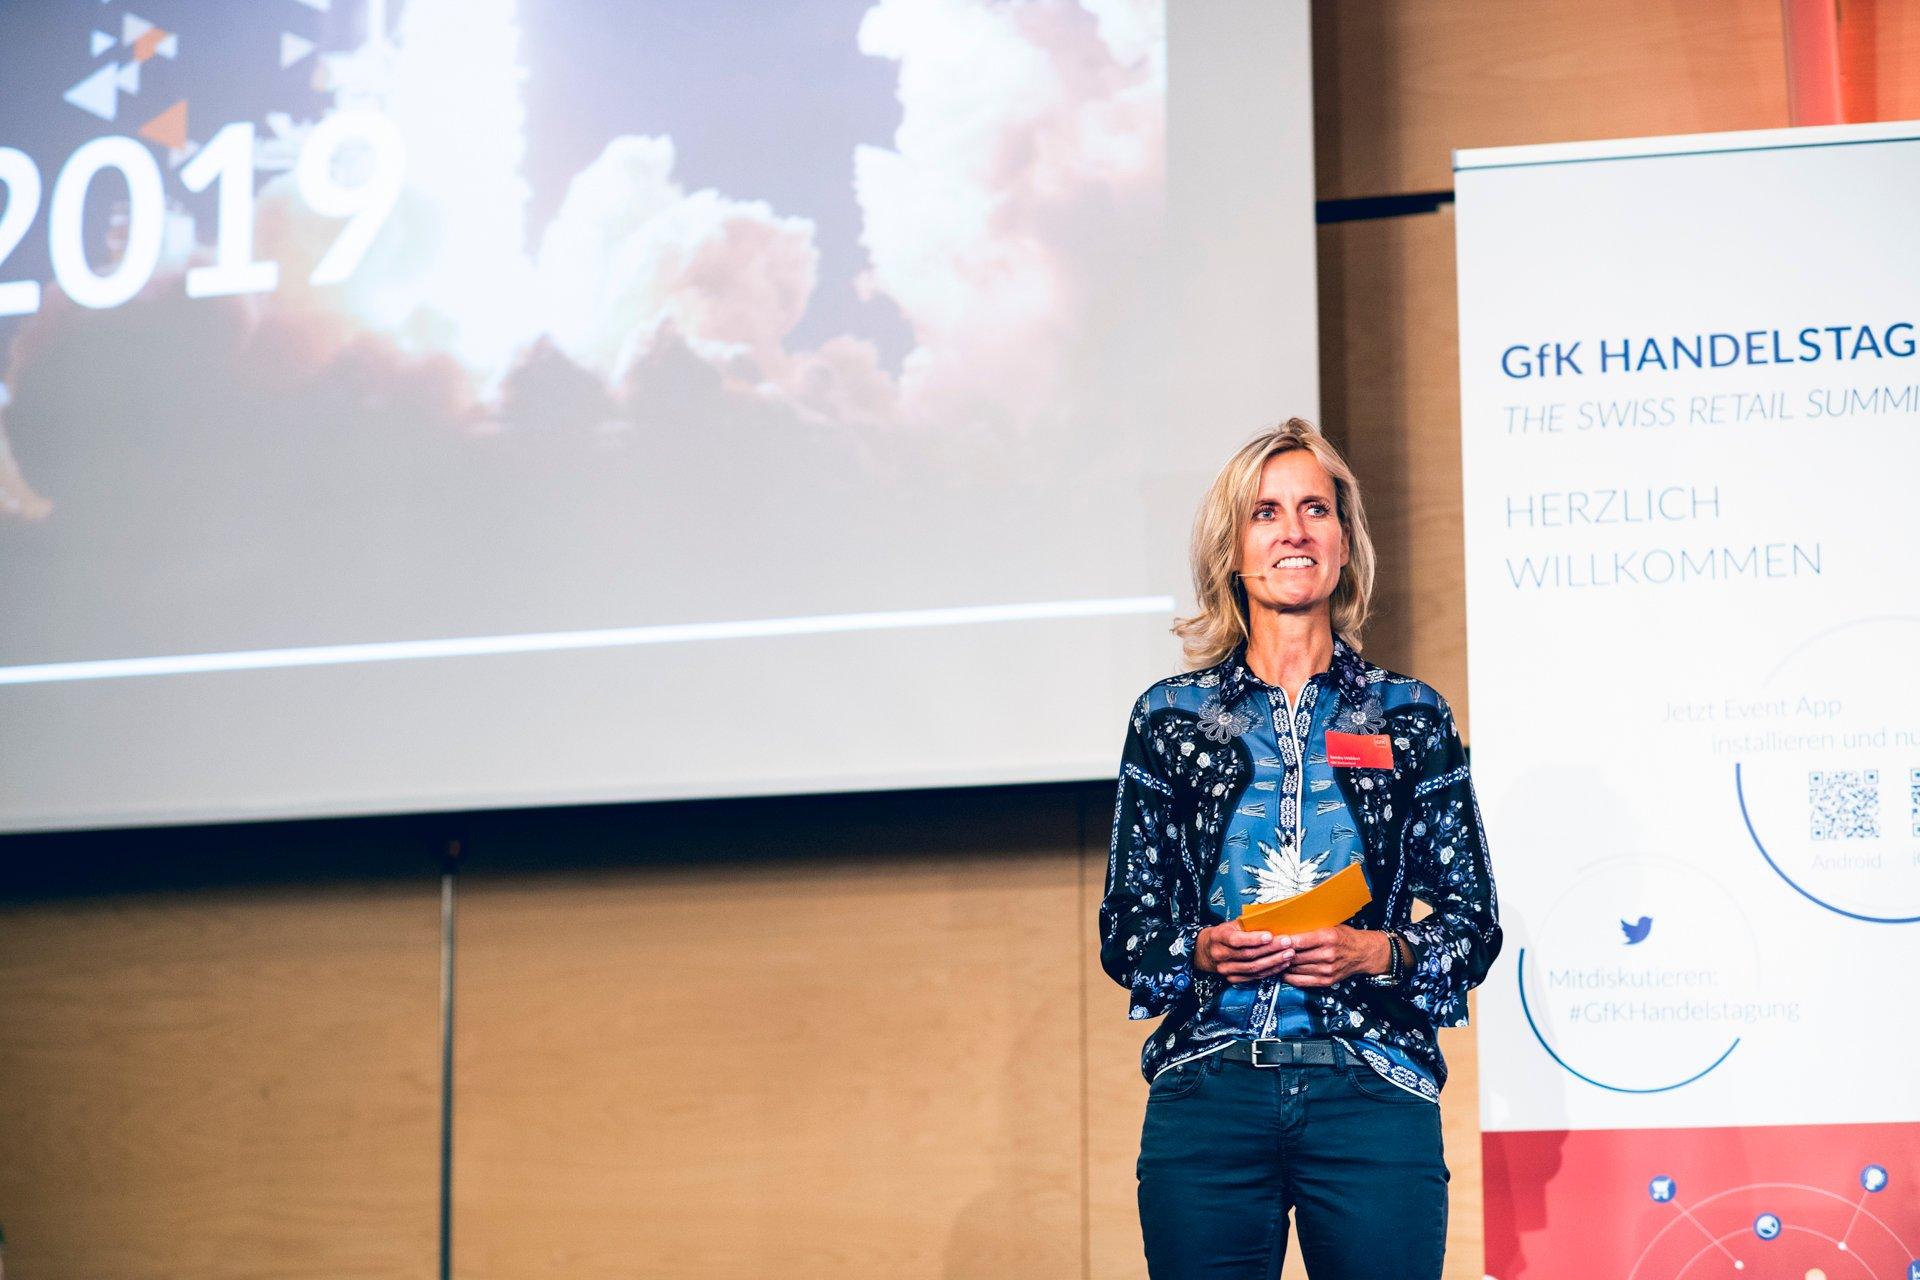 GfK Handelstagung 2019